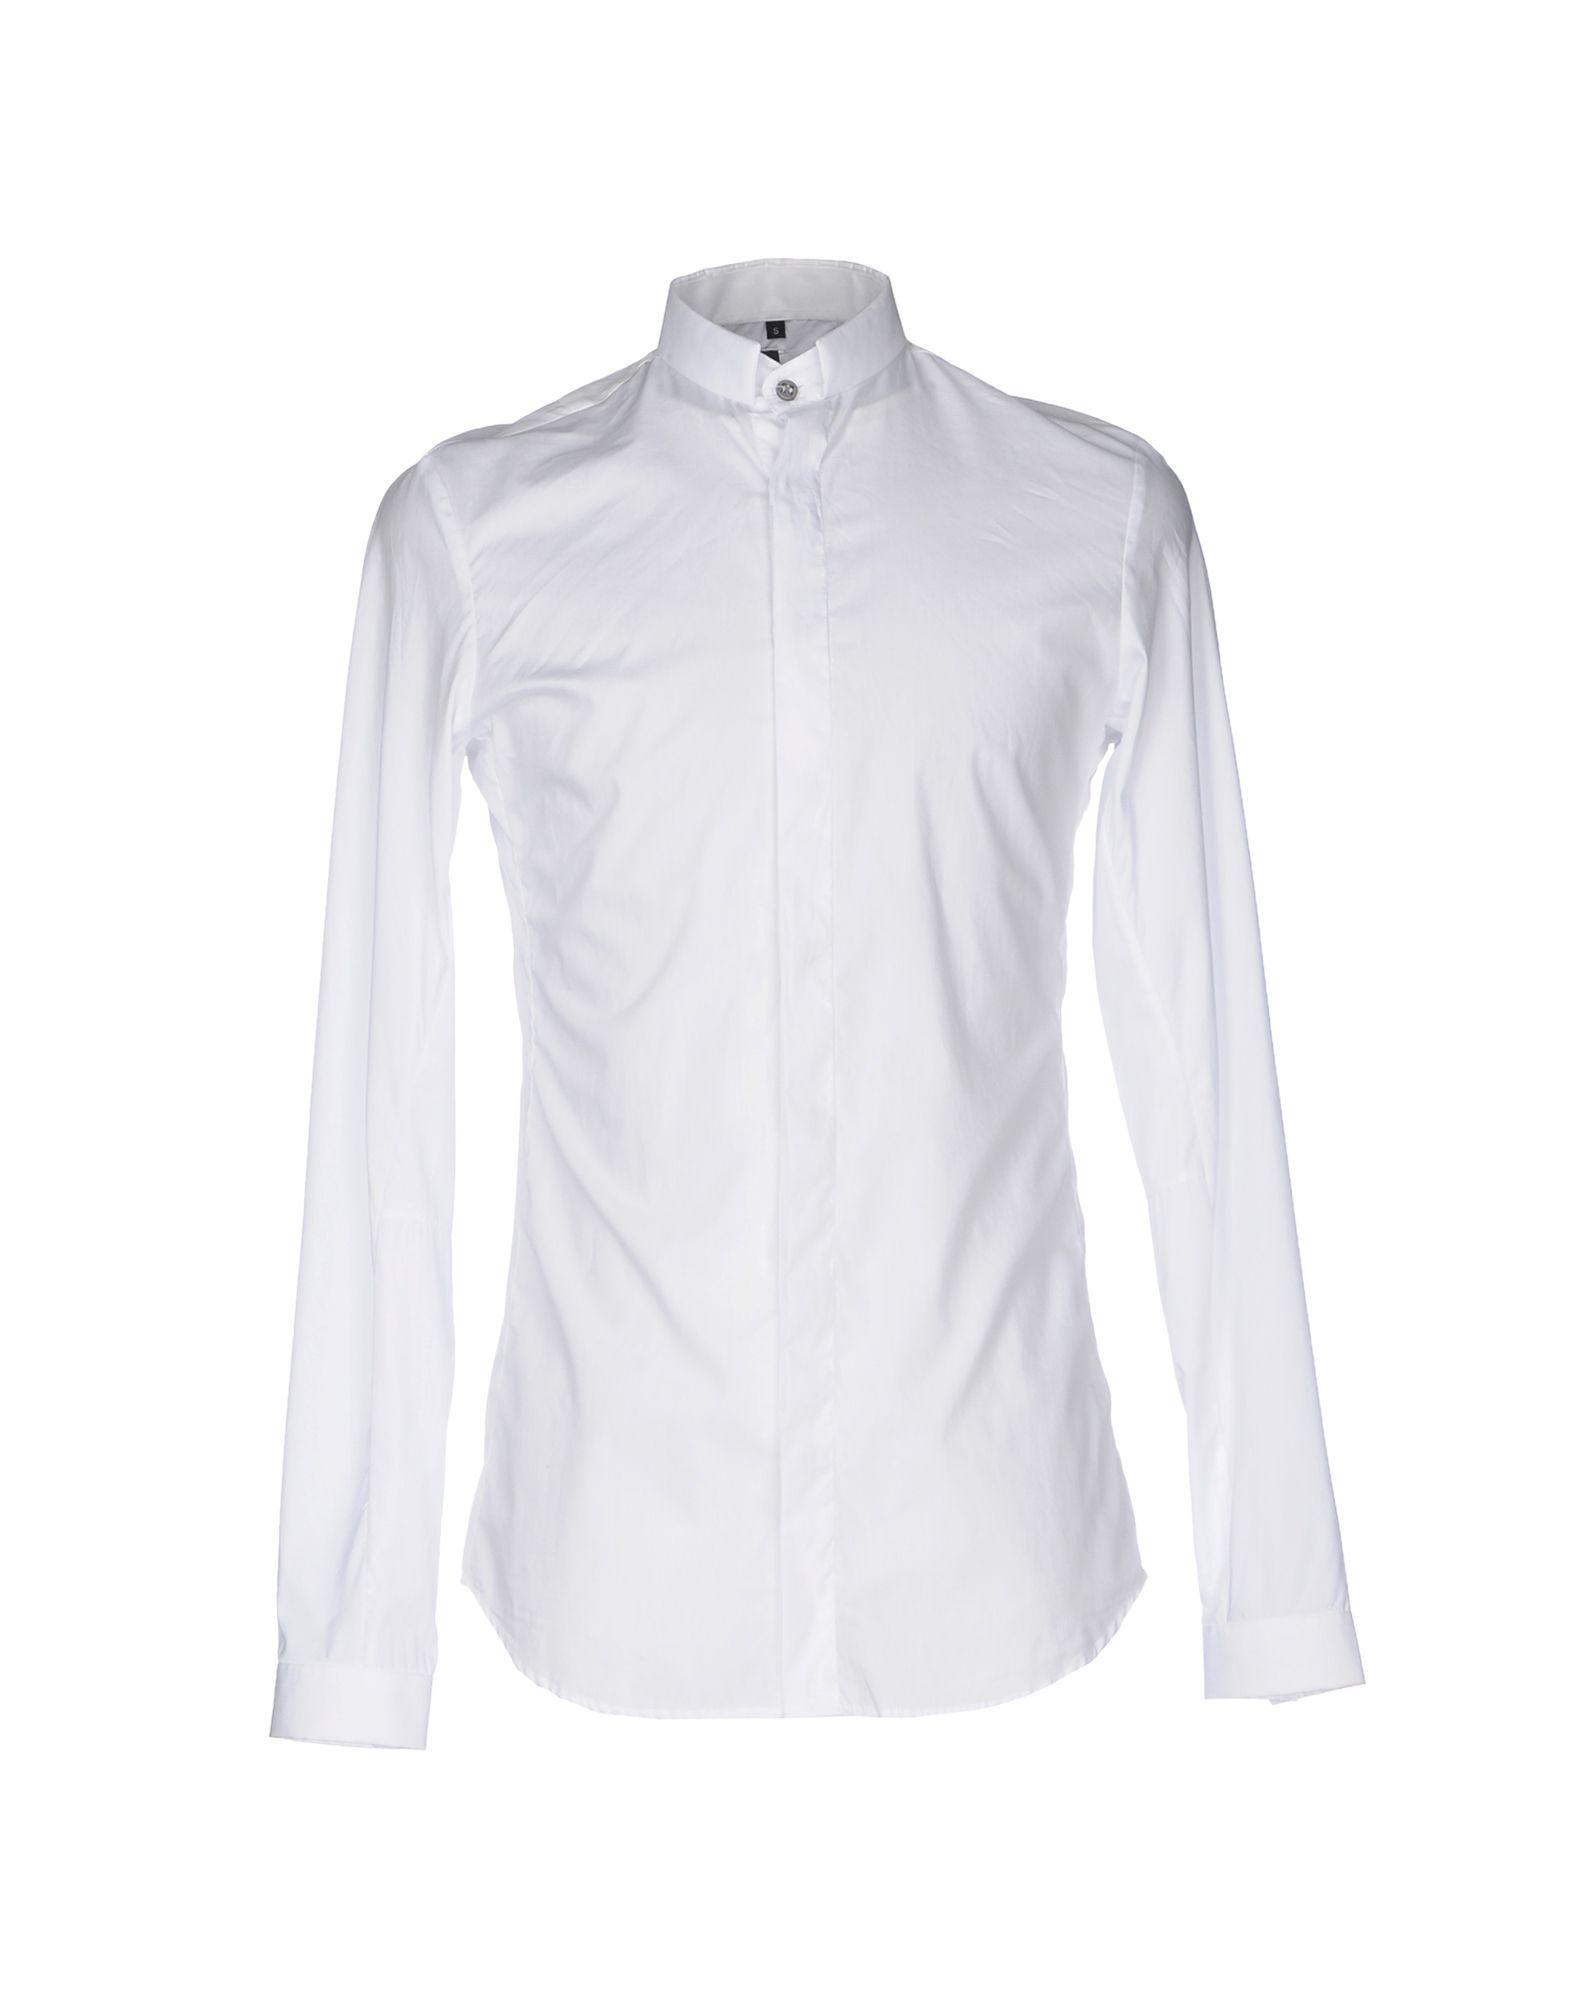 MANUEL MARTE Solid Color Shirt in White